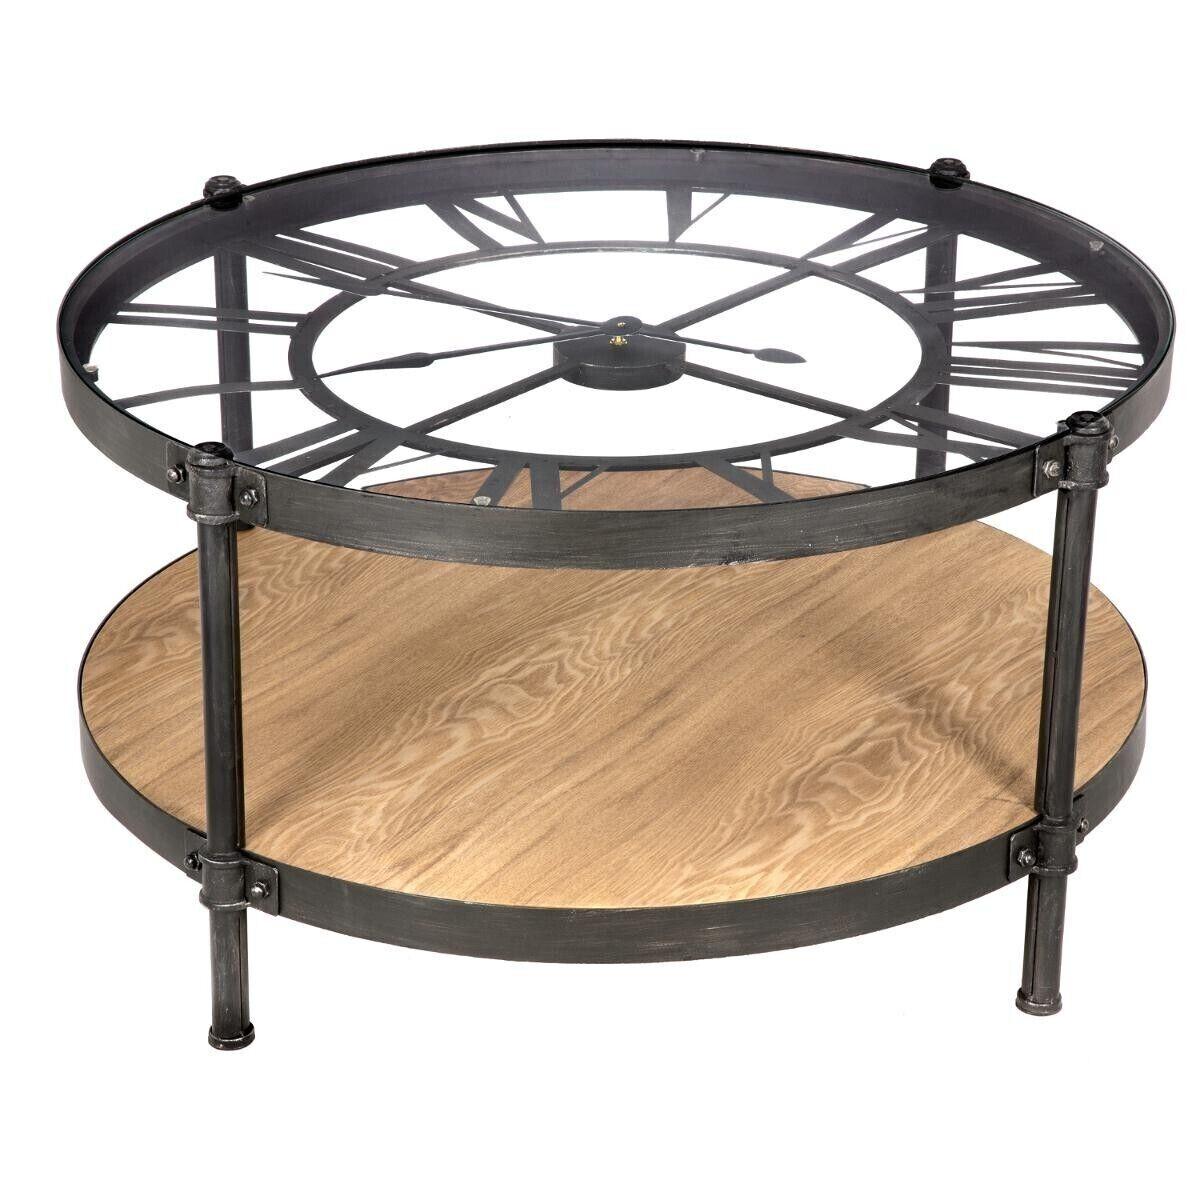 Atmosphera Table basse chrono 'Danik' D90 cm